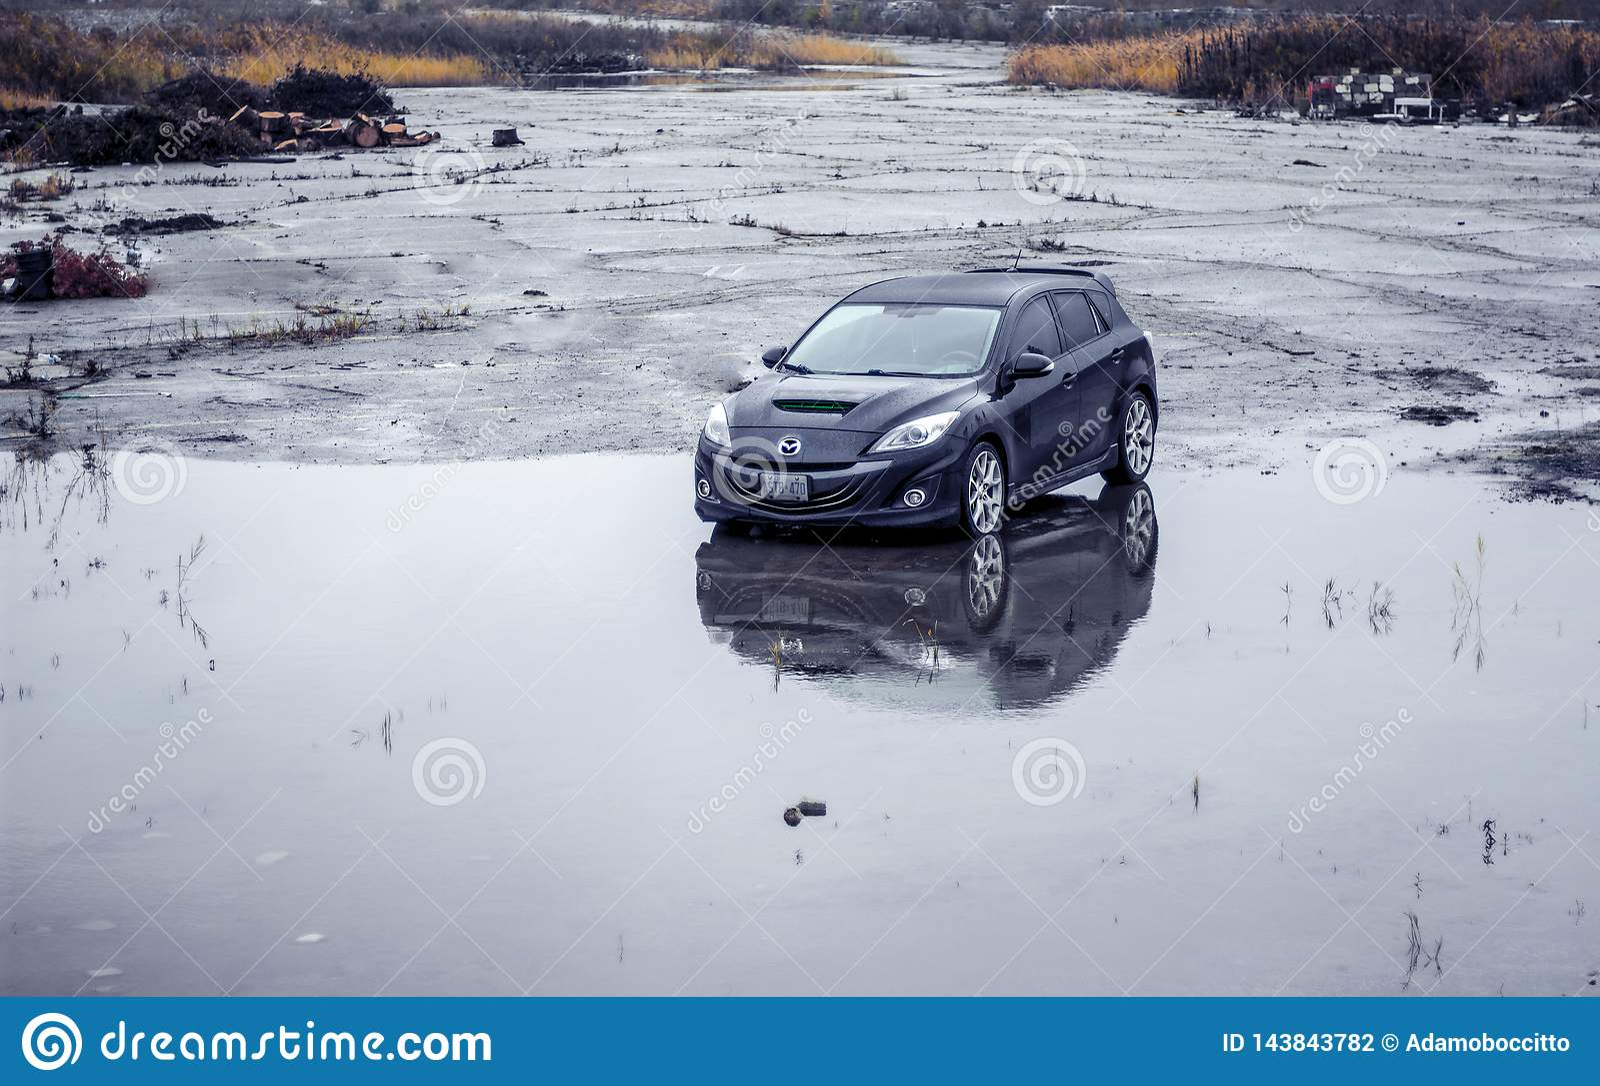 2010 Mazdaspeed3 negro n al estacionamiento mojado abandonado